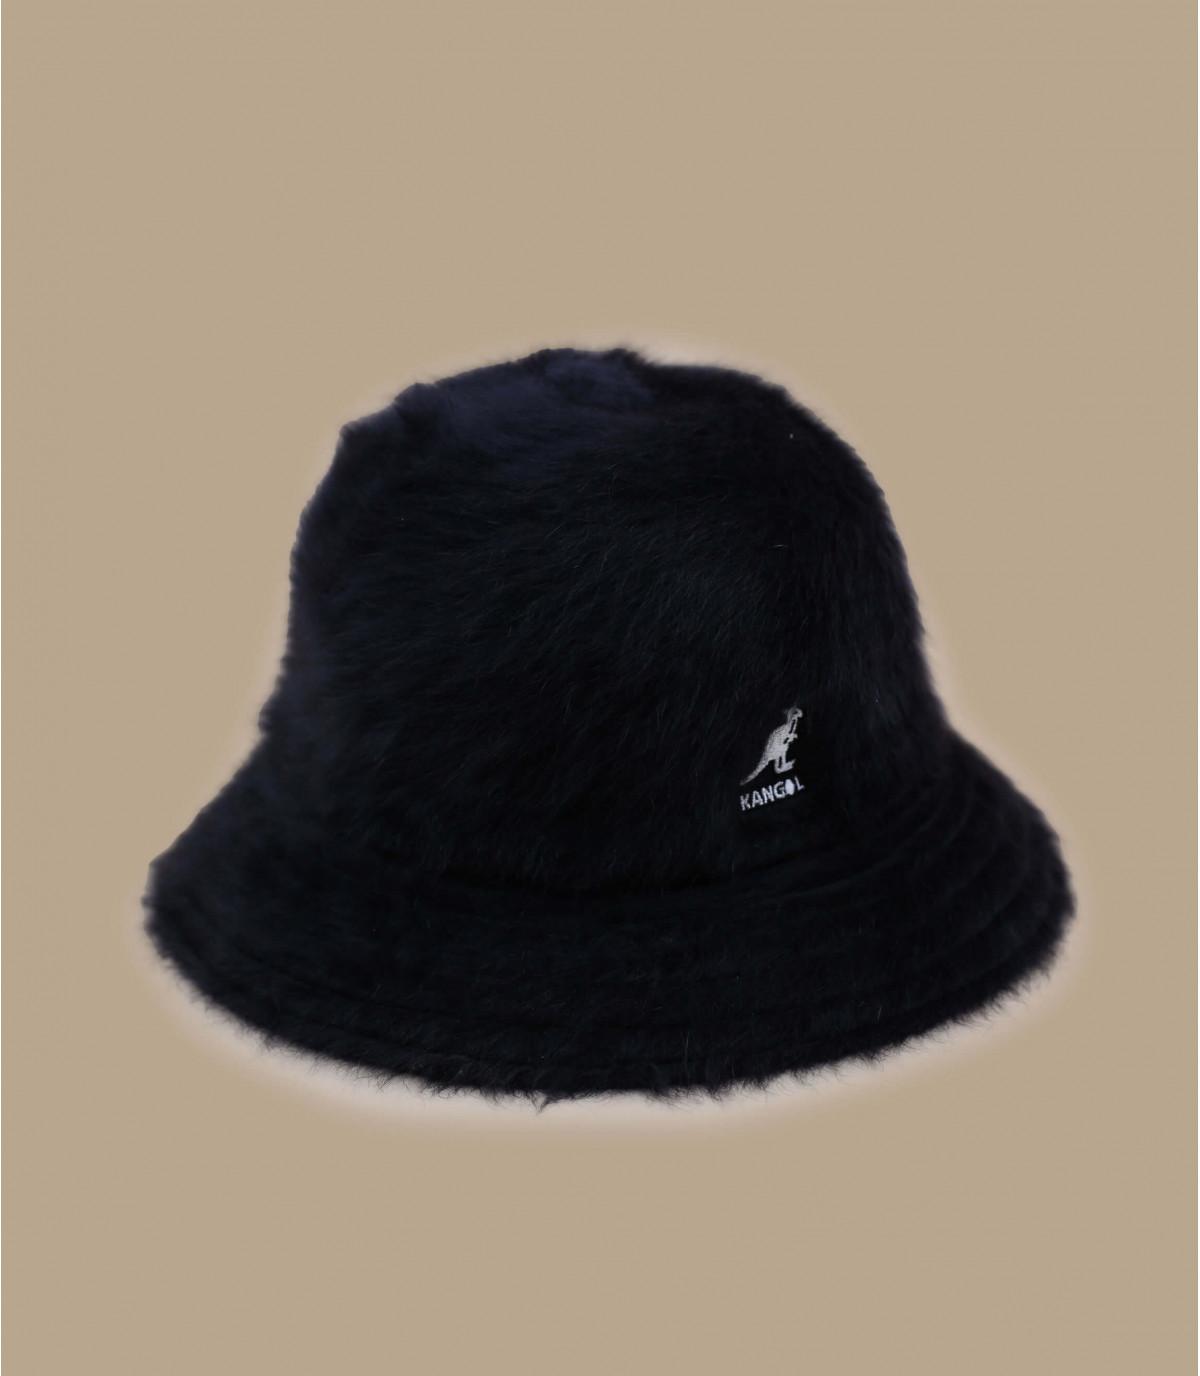 Kangol black bucket